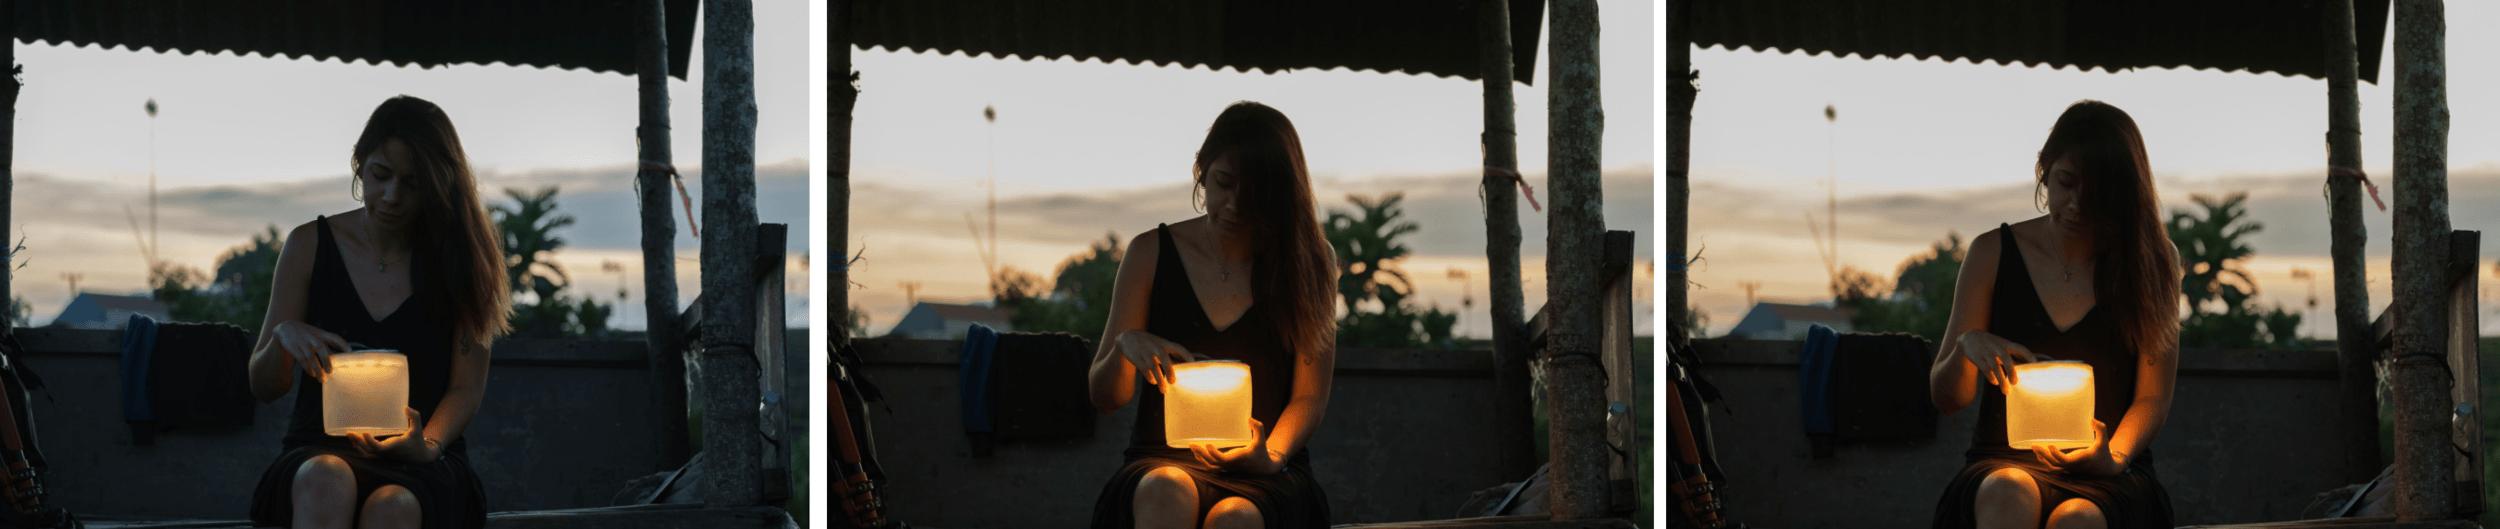 luci light